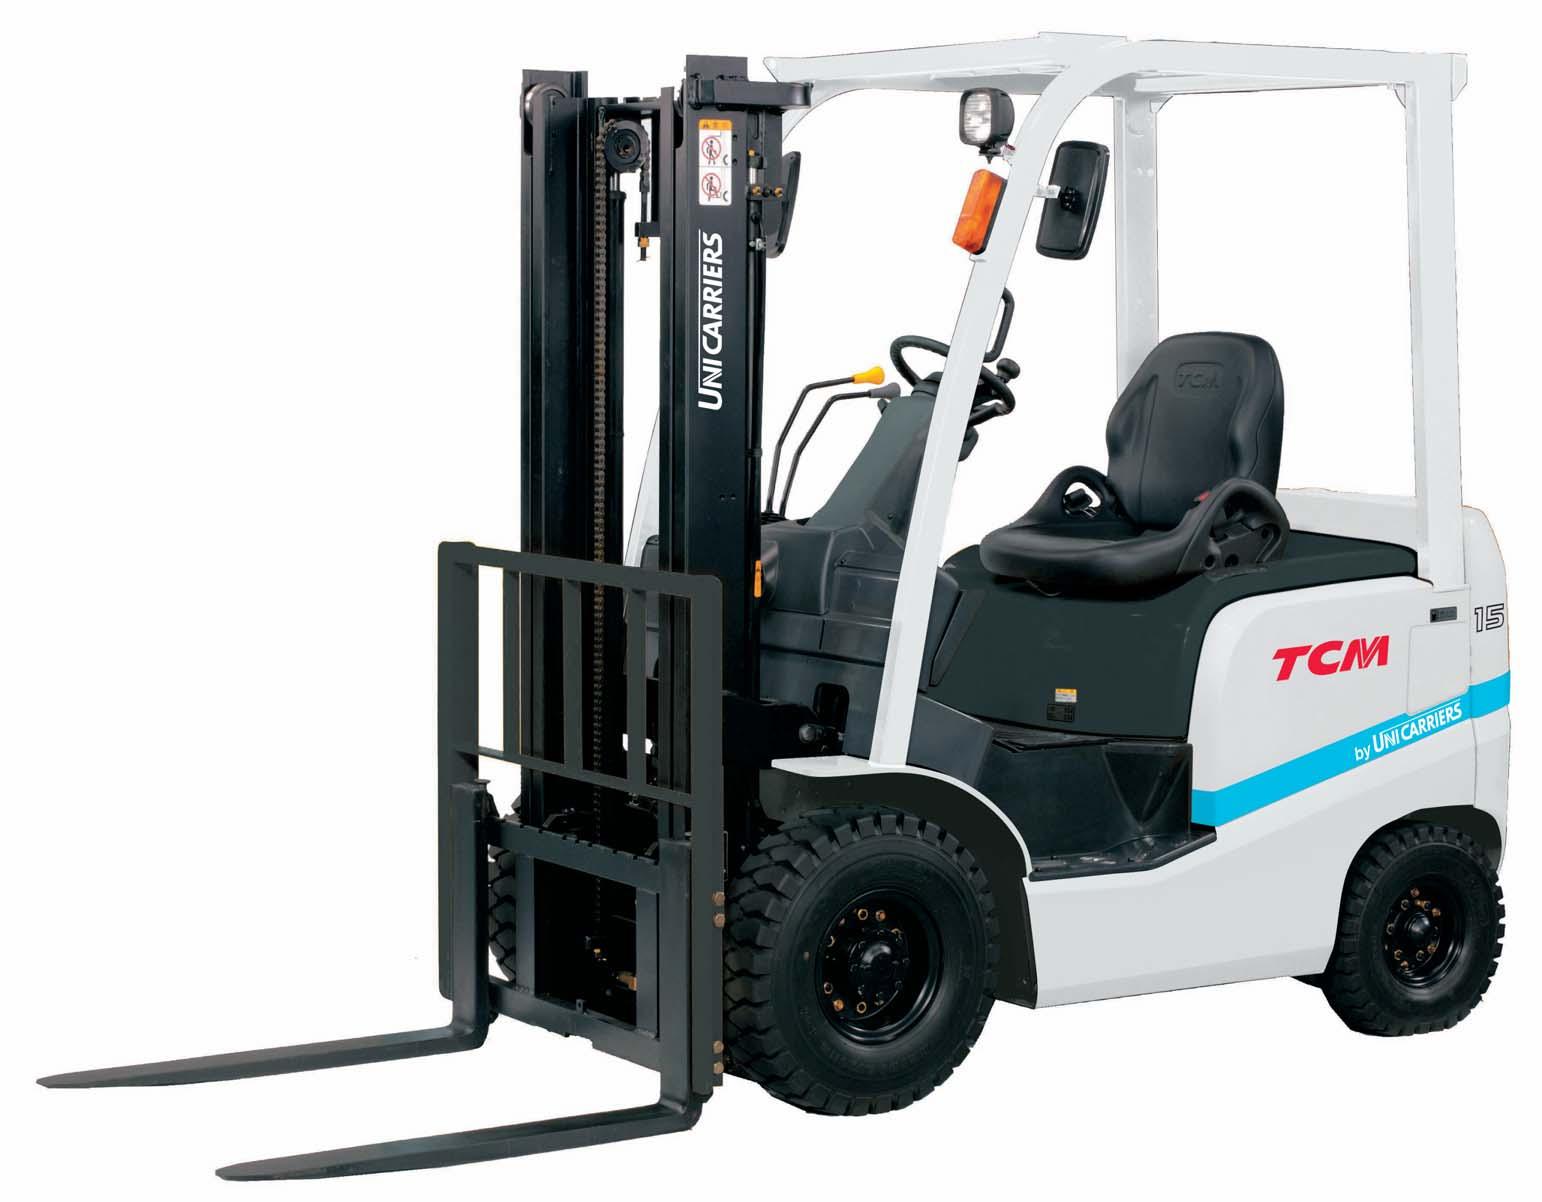 TCM FG30C3